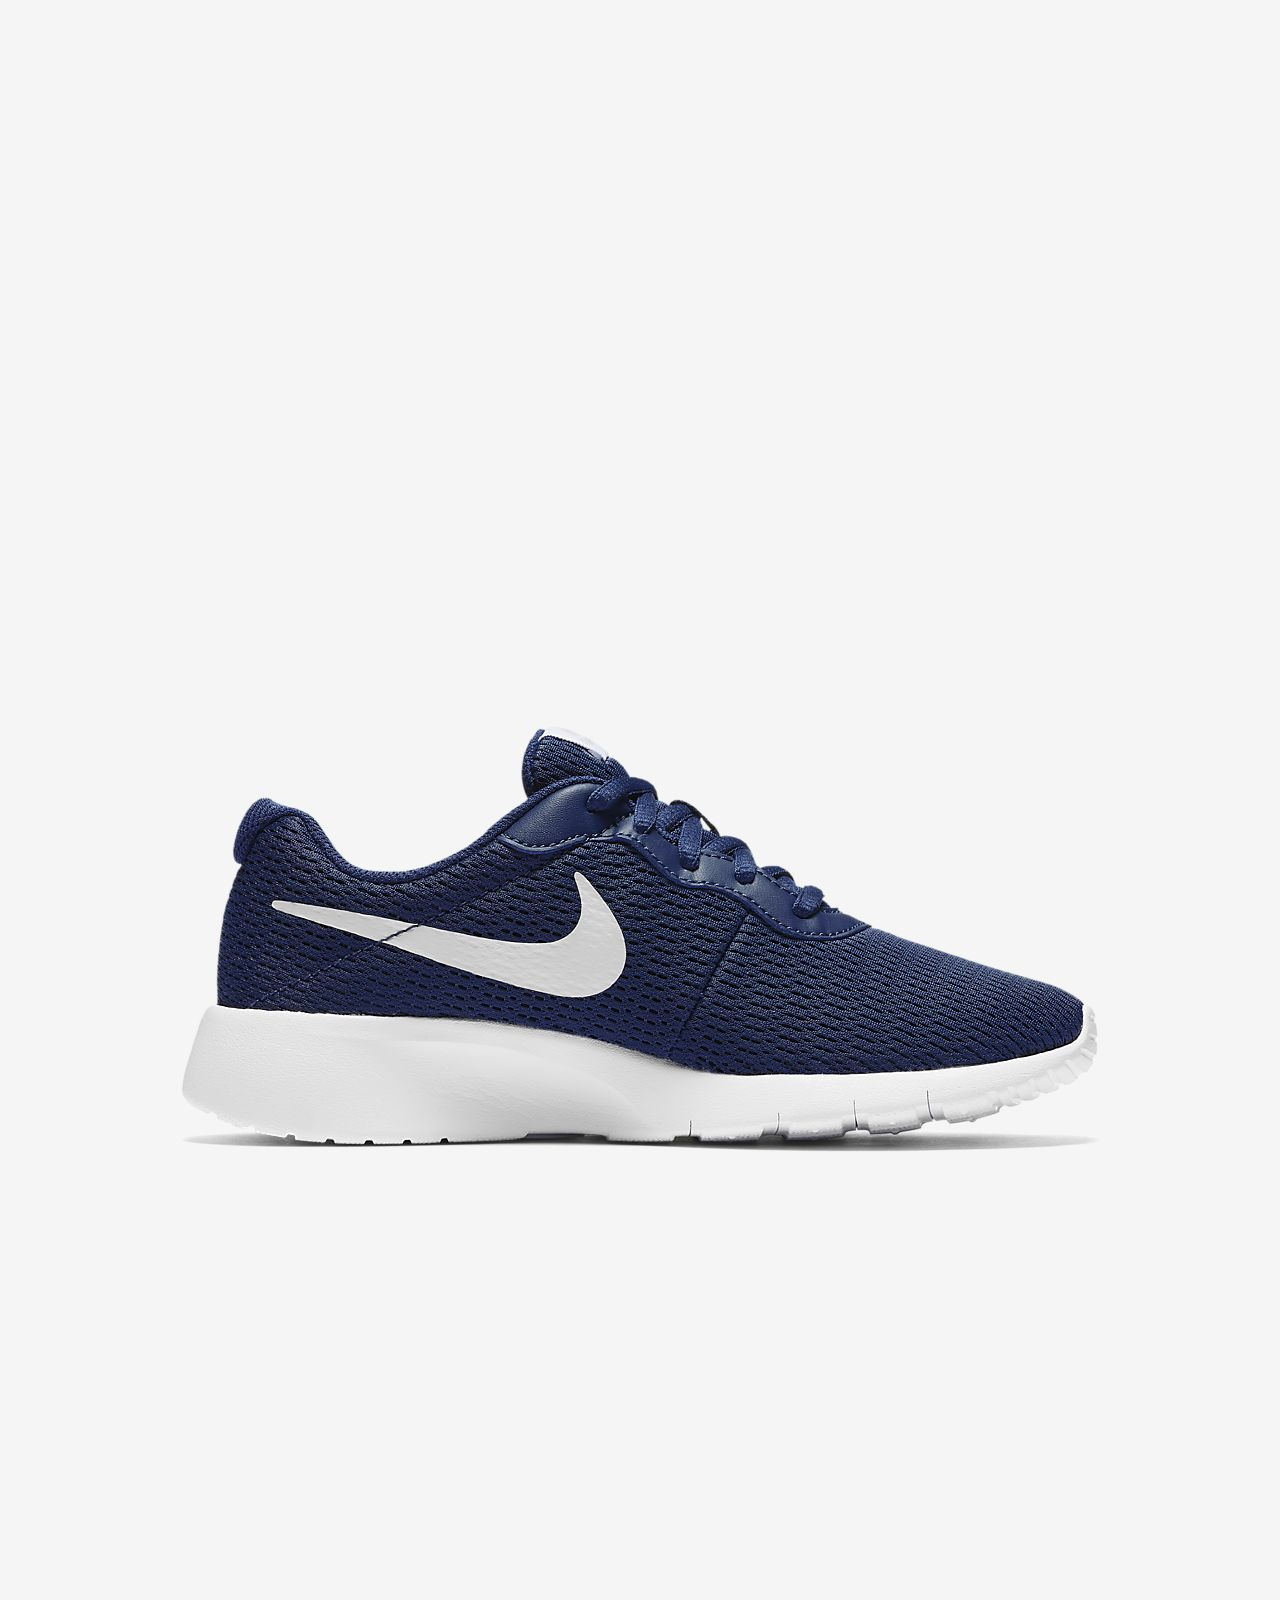 Chaussures Nike Tanjun grises garçon FxgPUTNjEt